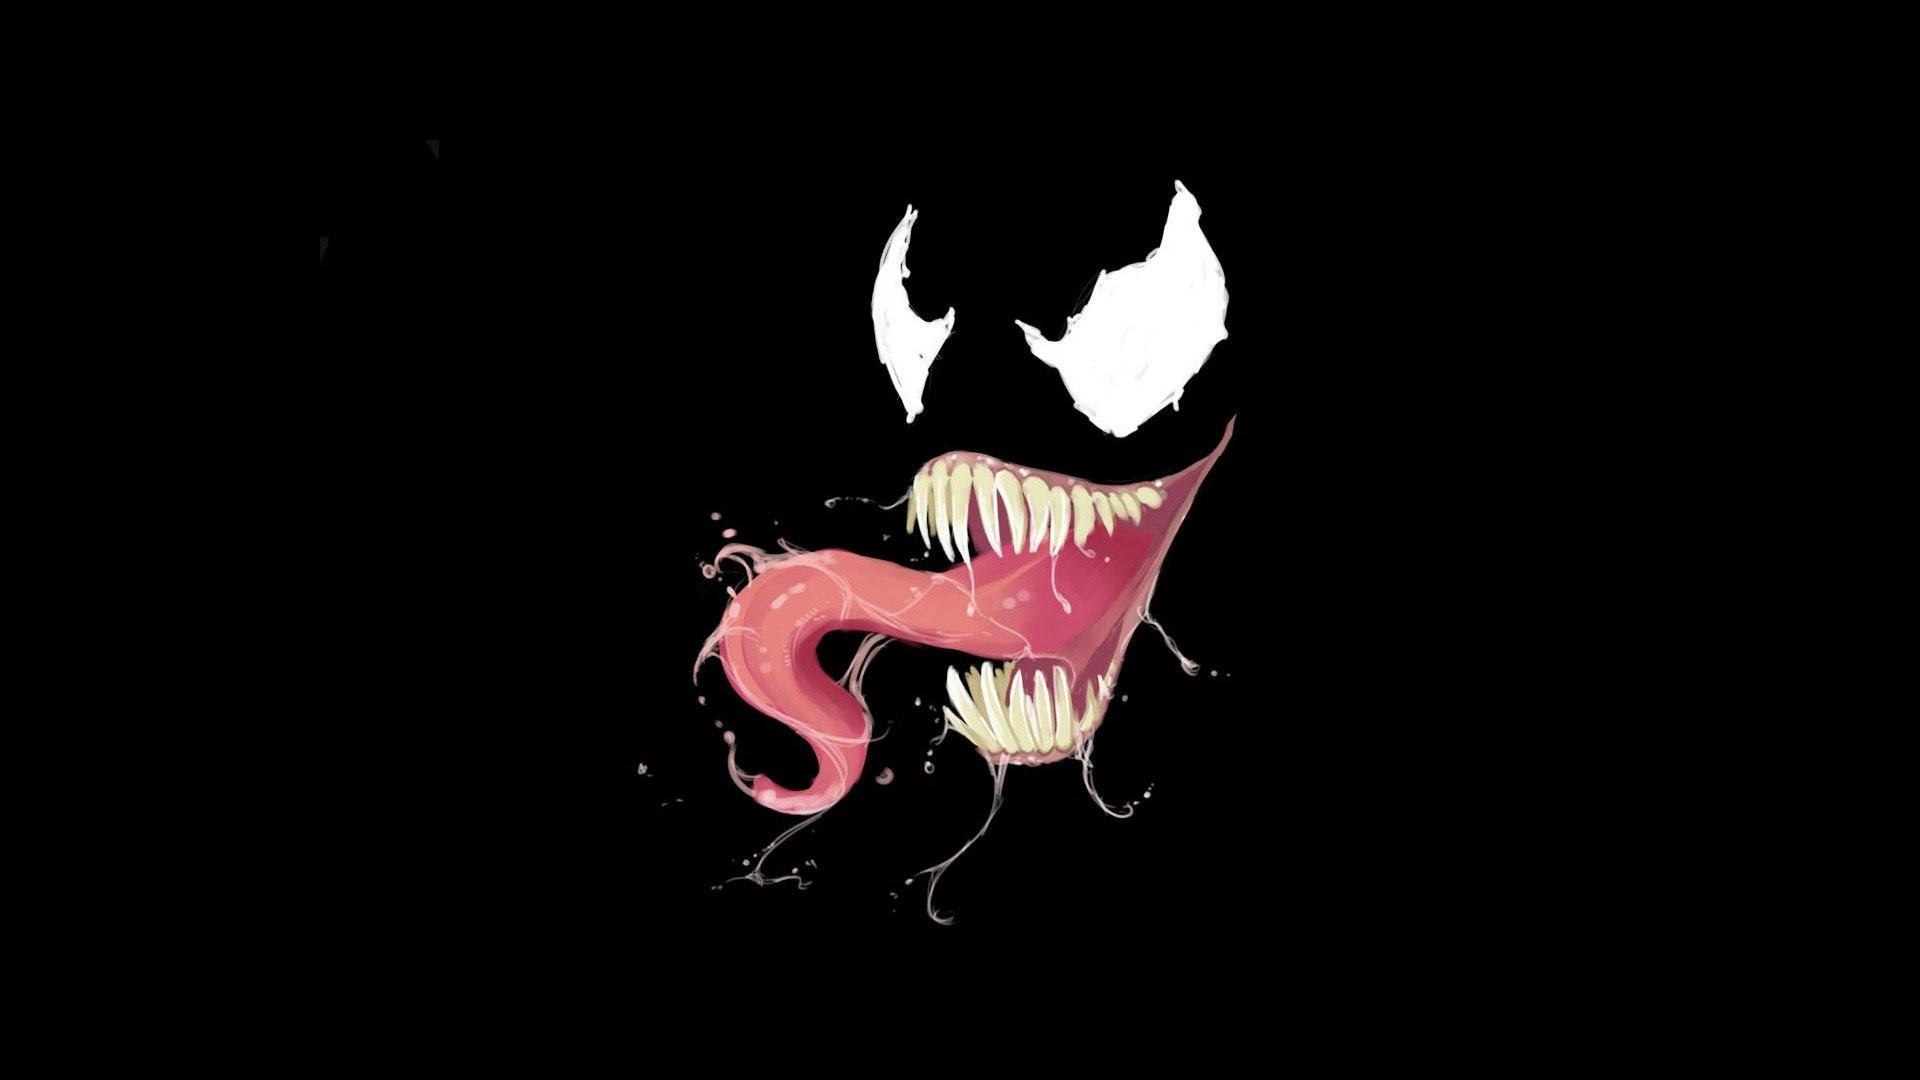 Spiderman Venom Wallpaper 59 Images